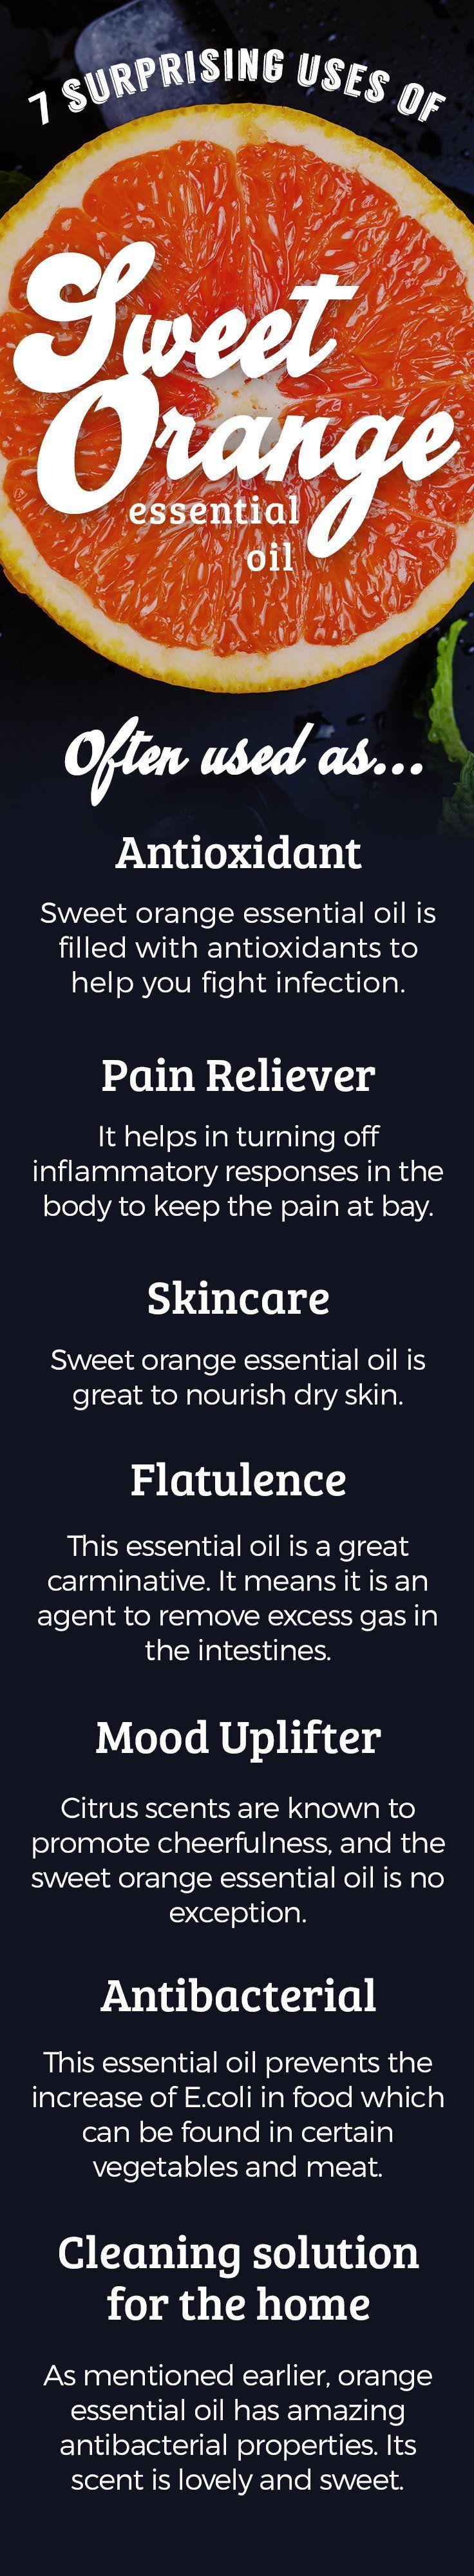 sweet orange essential oil uses infographic